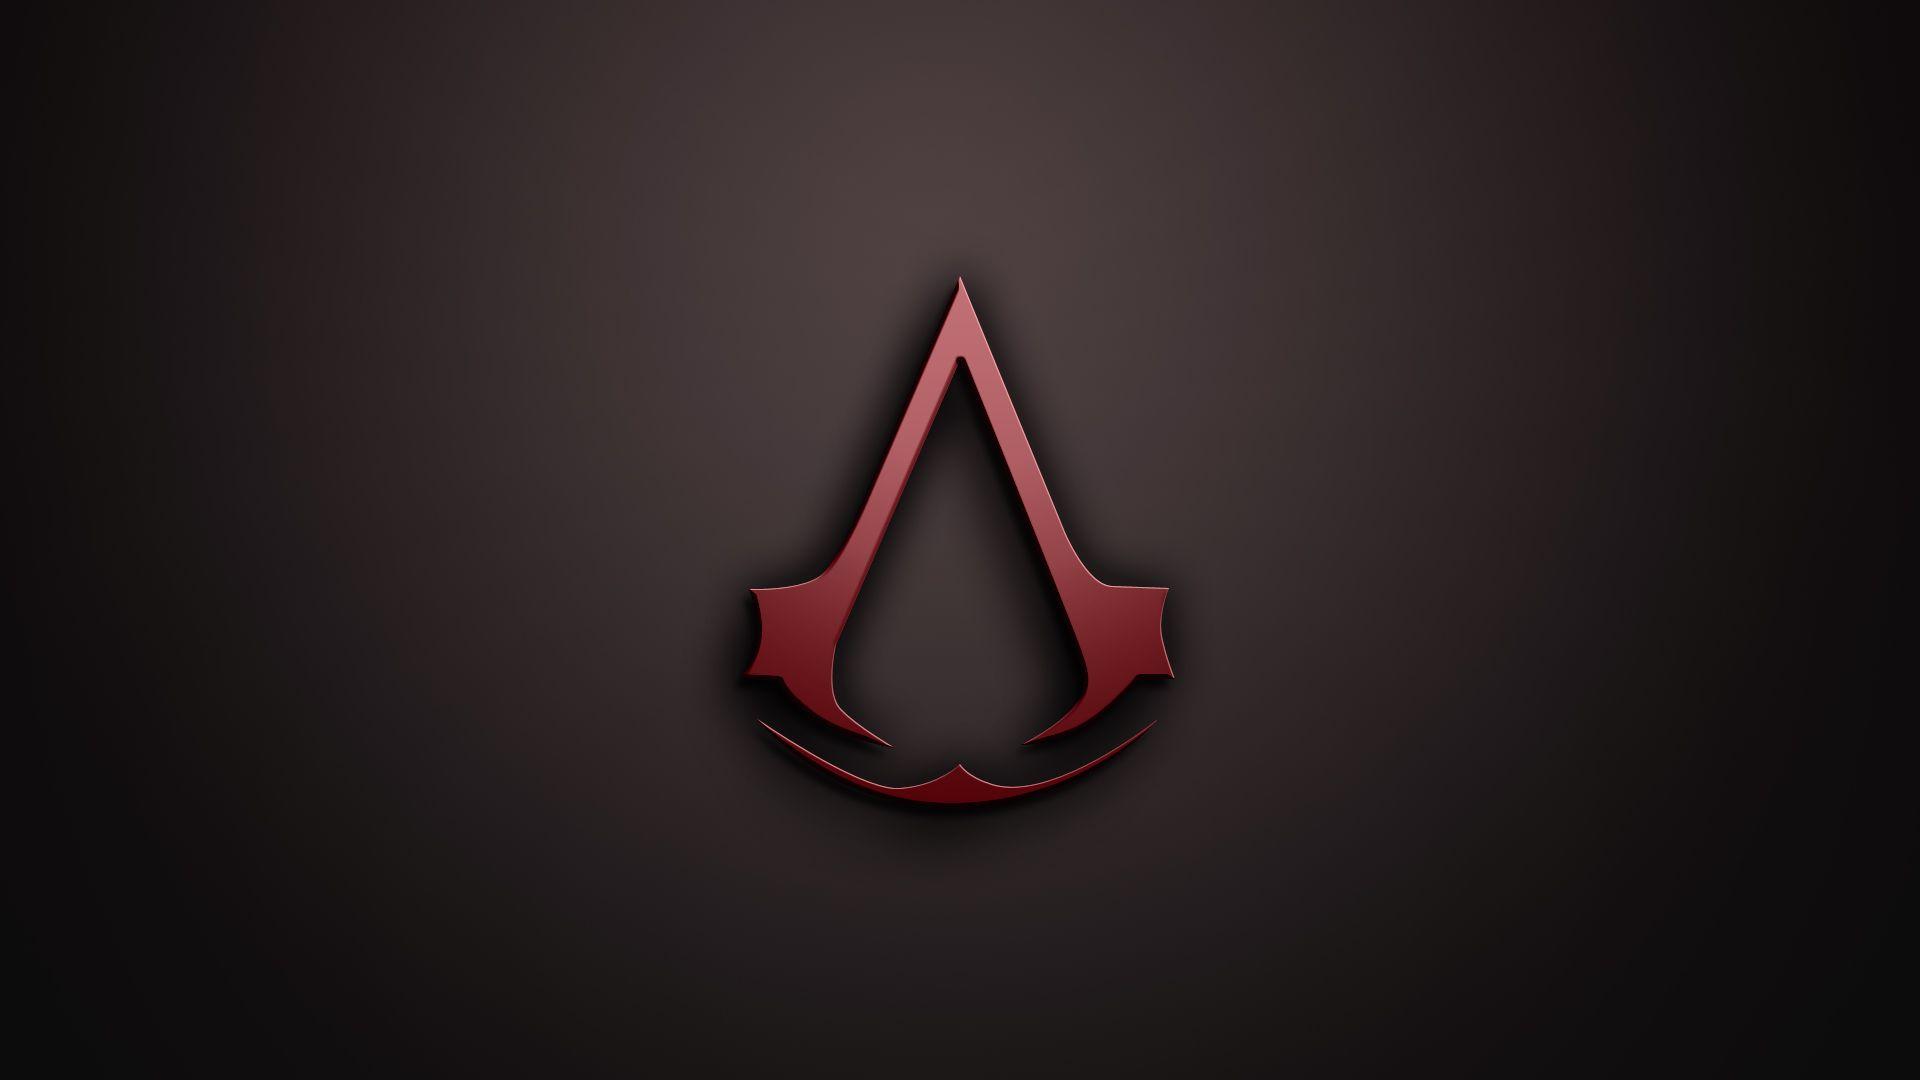 android assassins creed logo wallpaper phone